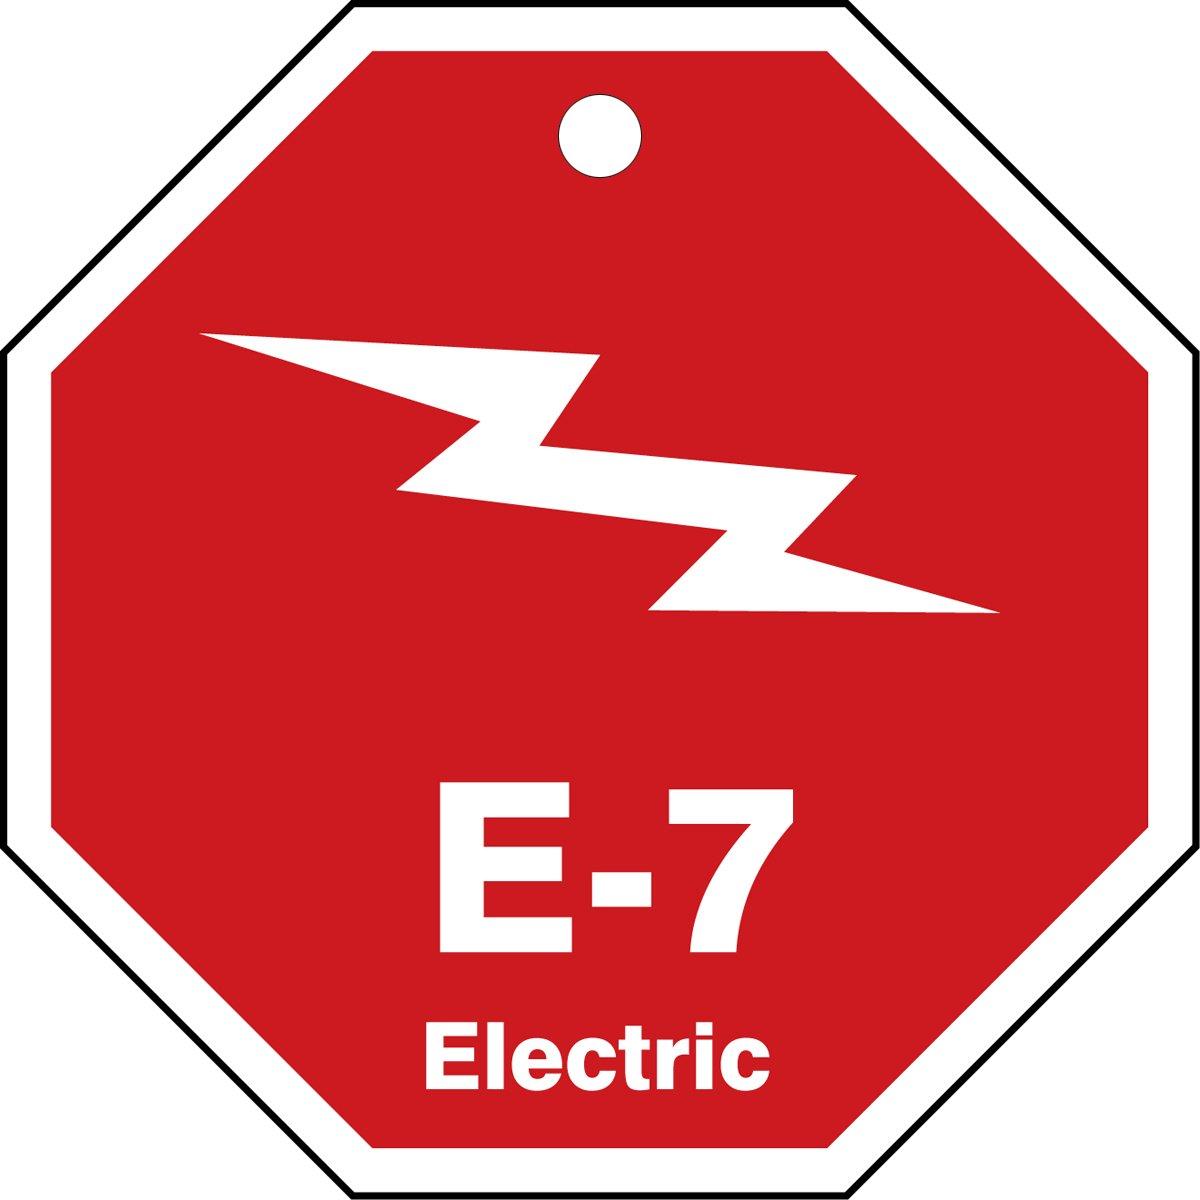 Accuform TDK307VPM PlasticE-7 Electric Energy Source Shape ID Tag 2-1//2 W x 2-1//2 L 2-1//2 W x 2-1//2 L White on Red Pack of 5